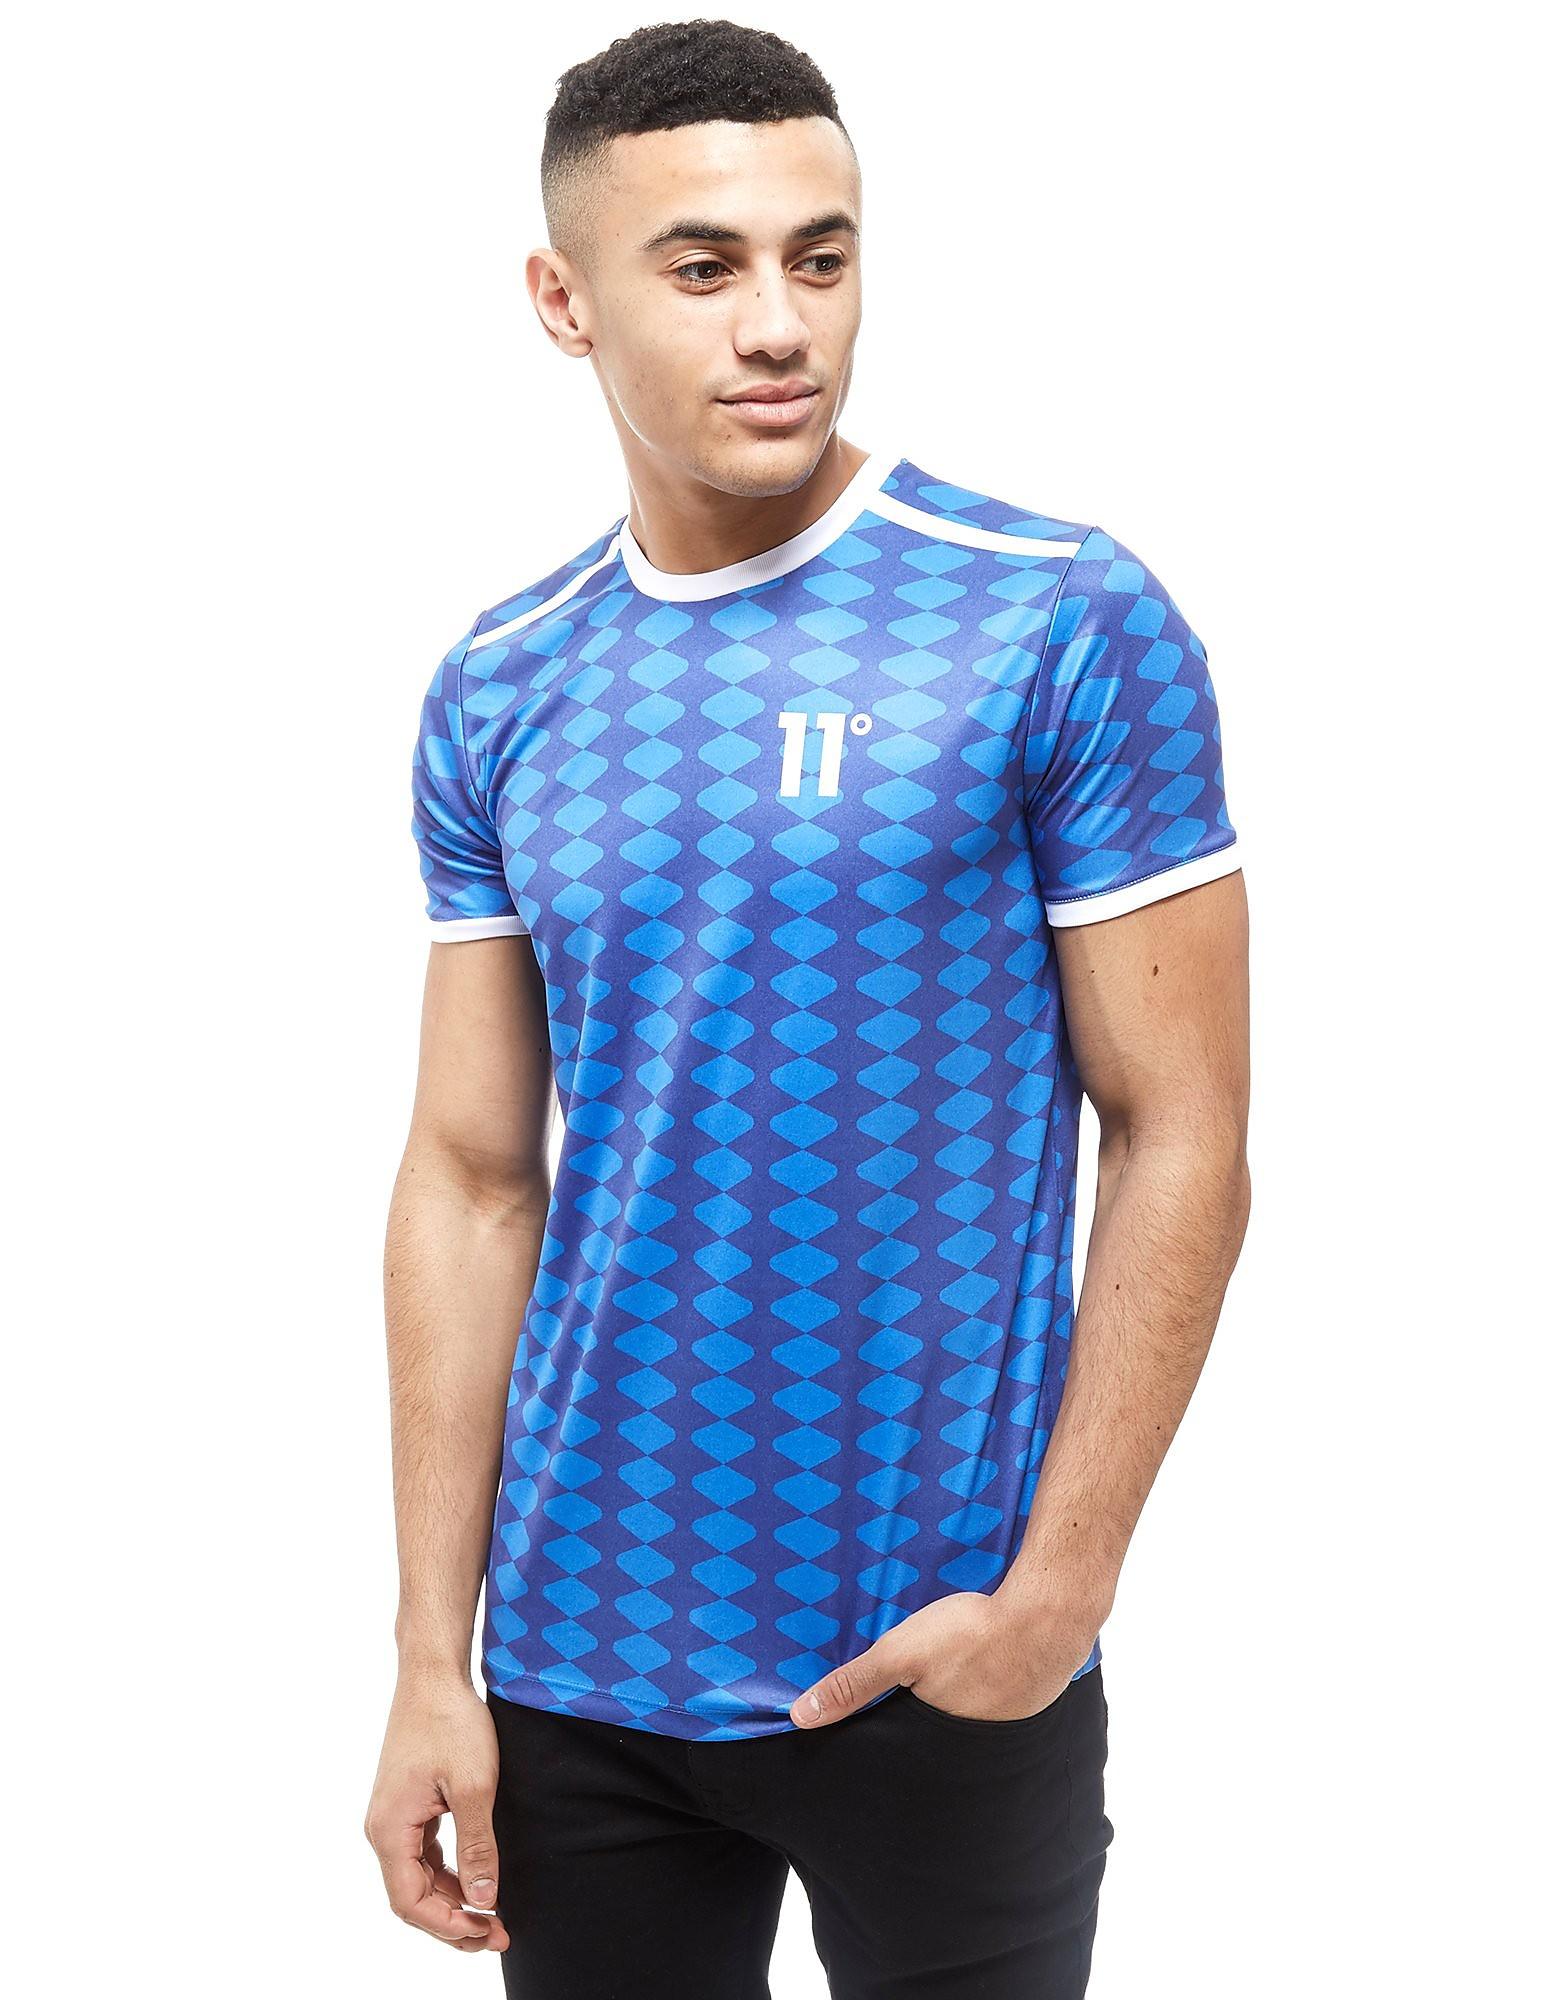 11 Degrees Diamond Football T-Shirt